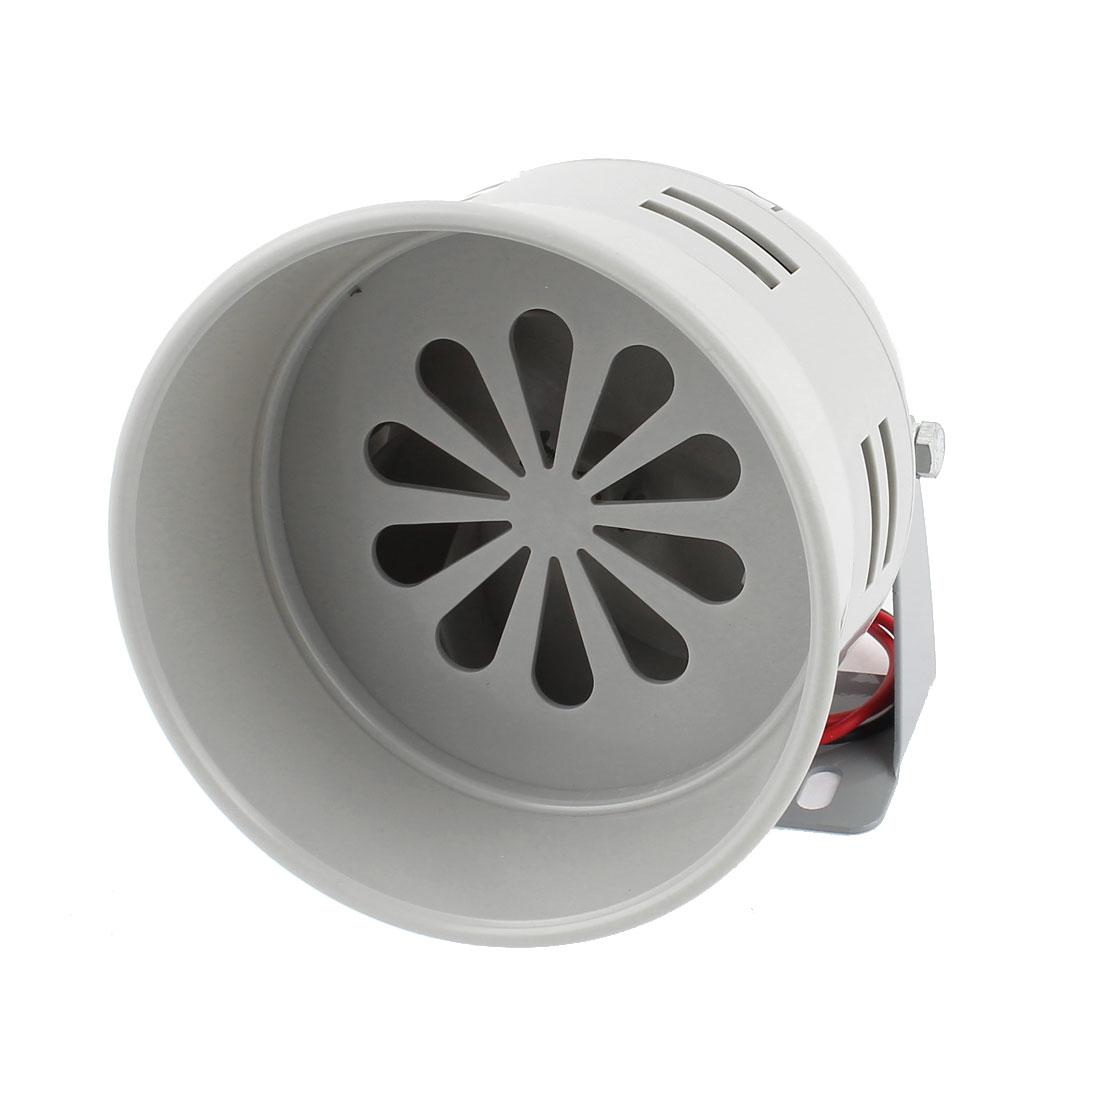 MS-290 Gray Plastic Industrial Alarm Sound Motor Siren Horn 120dB DC 12V